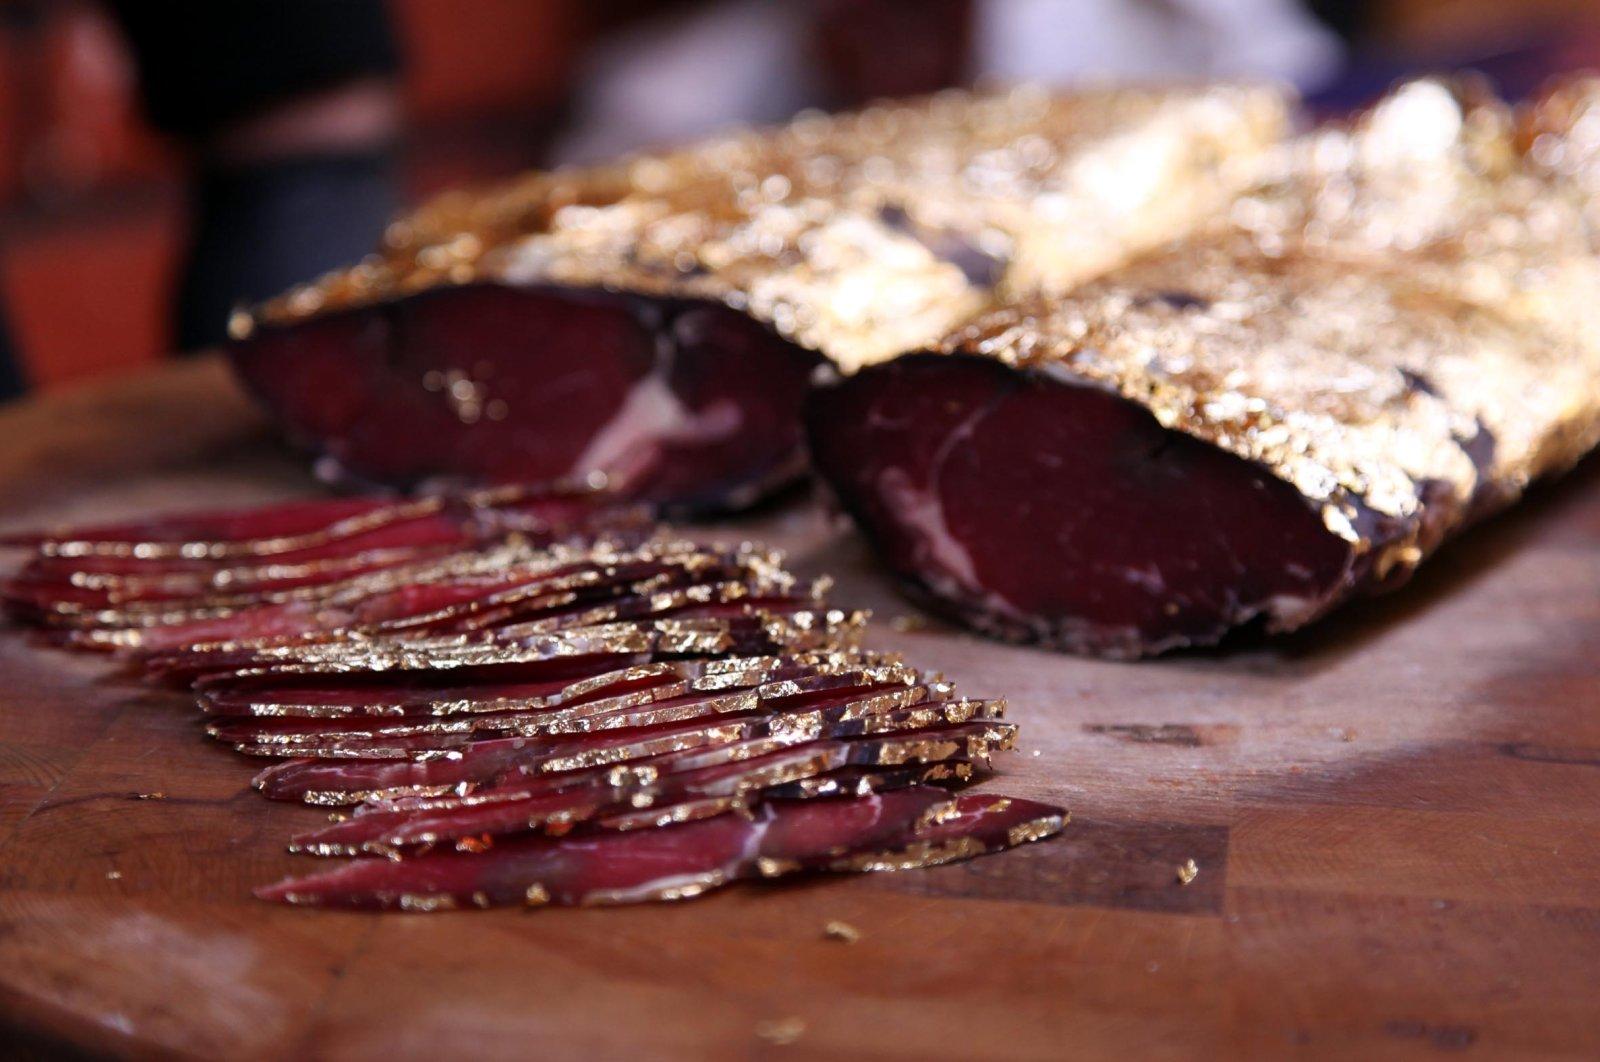 Halal luxury: Kayseri's famed pastırma dripping in edible gold | Daily Sabah